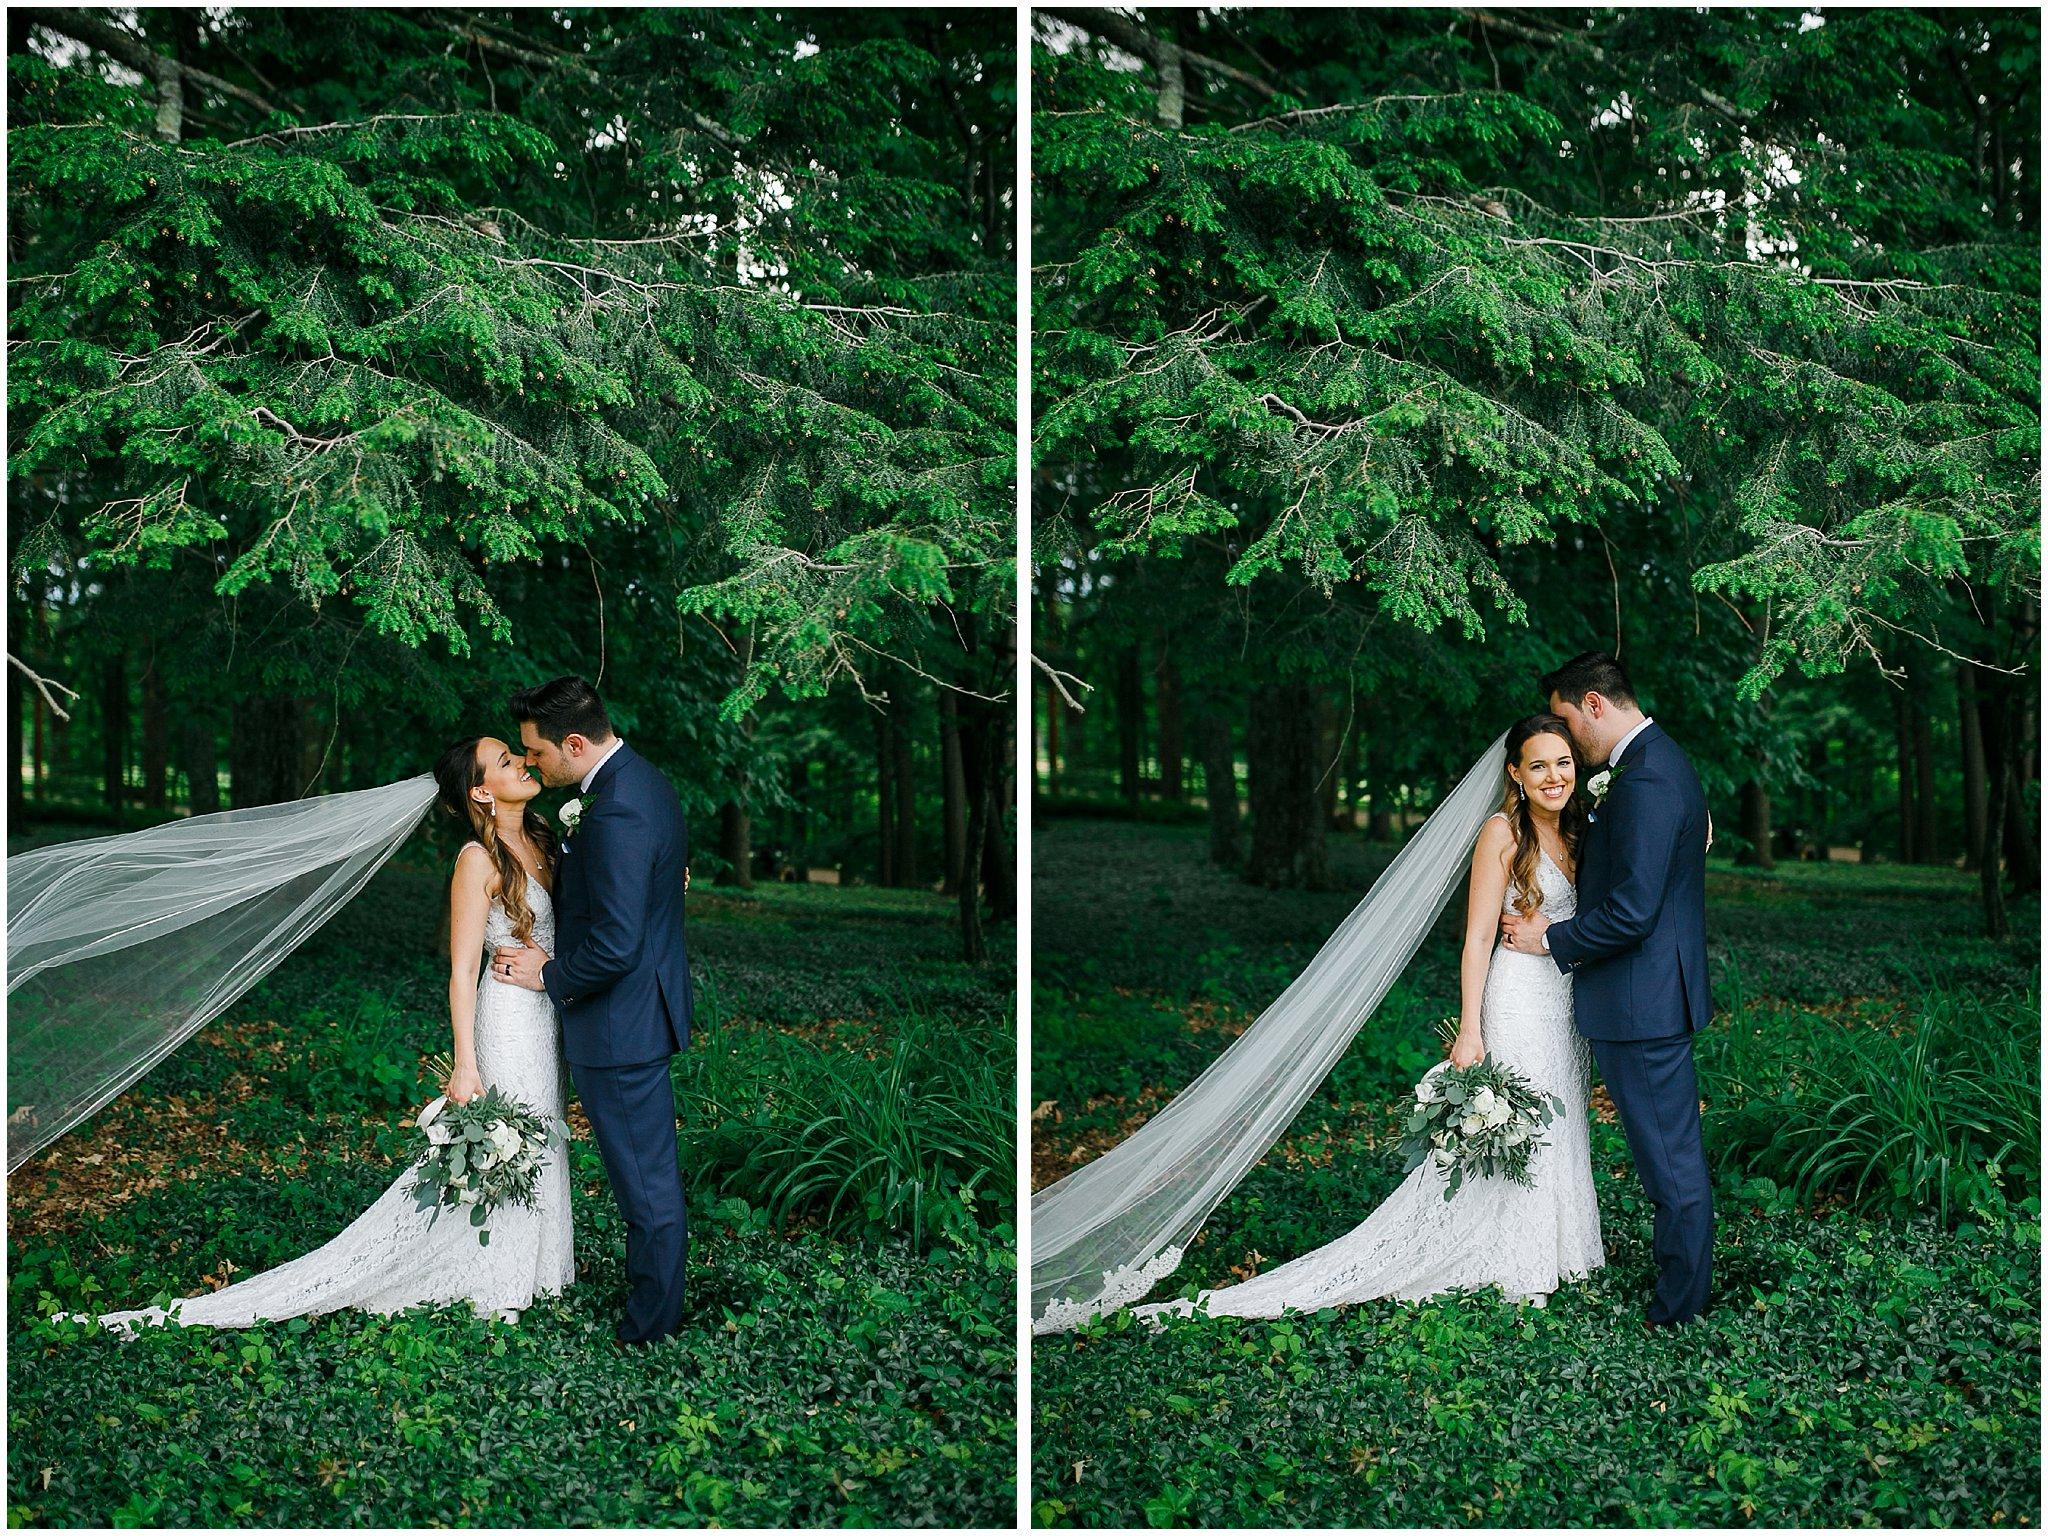 Hudson Valley Weddings at the Hill Hudson New York Wedding Photographer63.jpg